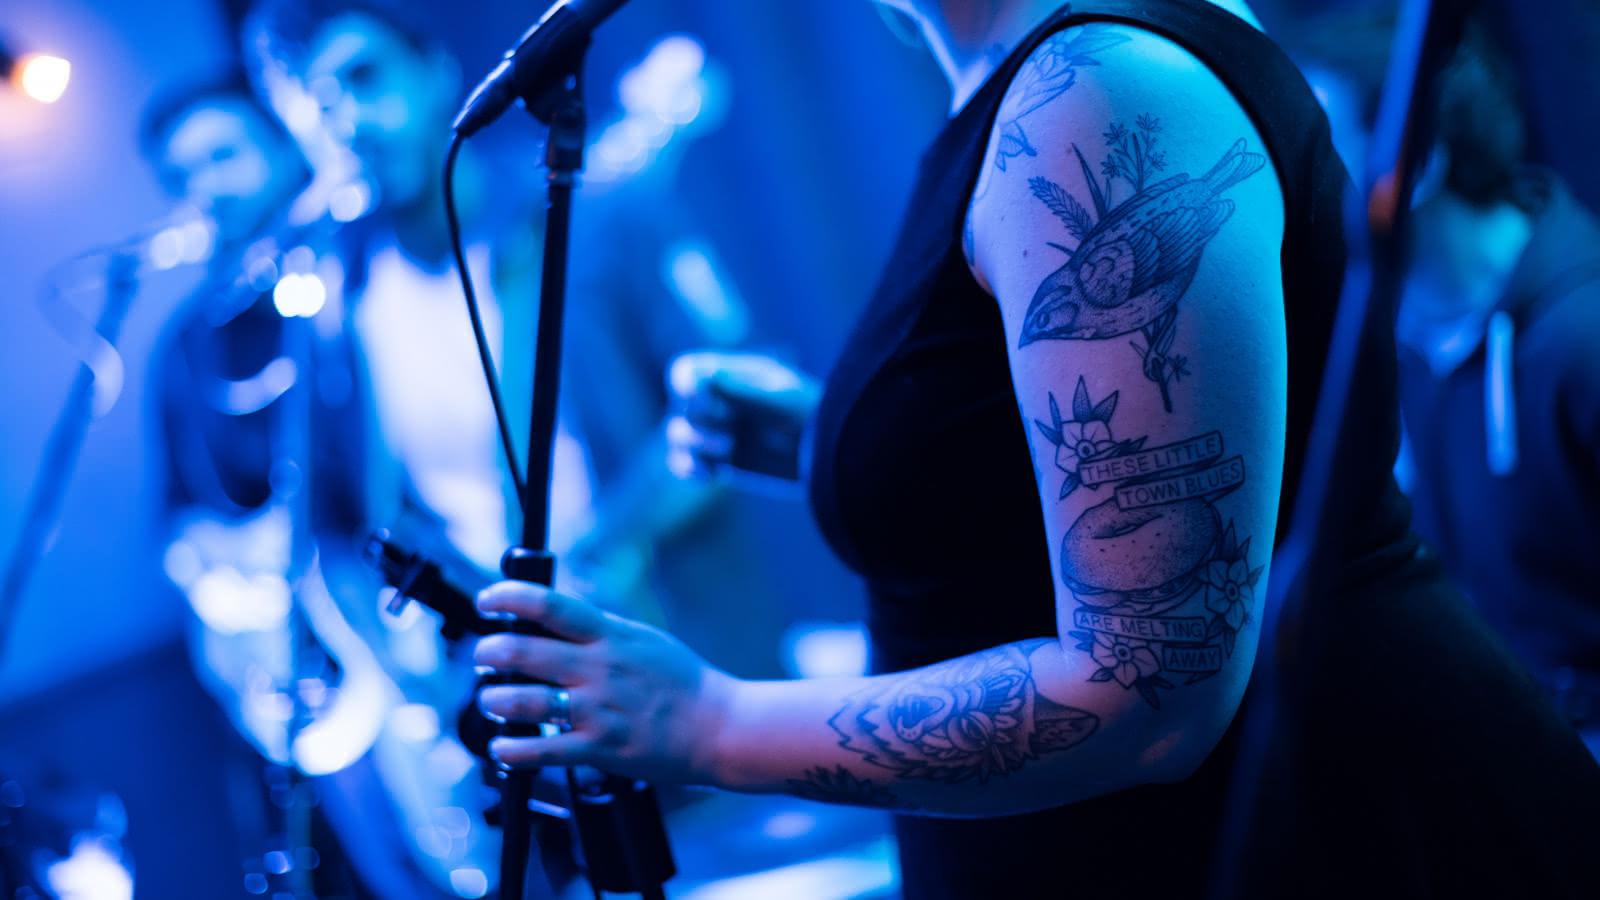 Le sens de la fête et de l'afterski dans les bars de discothèques de méribel